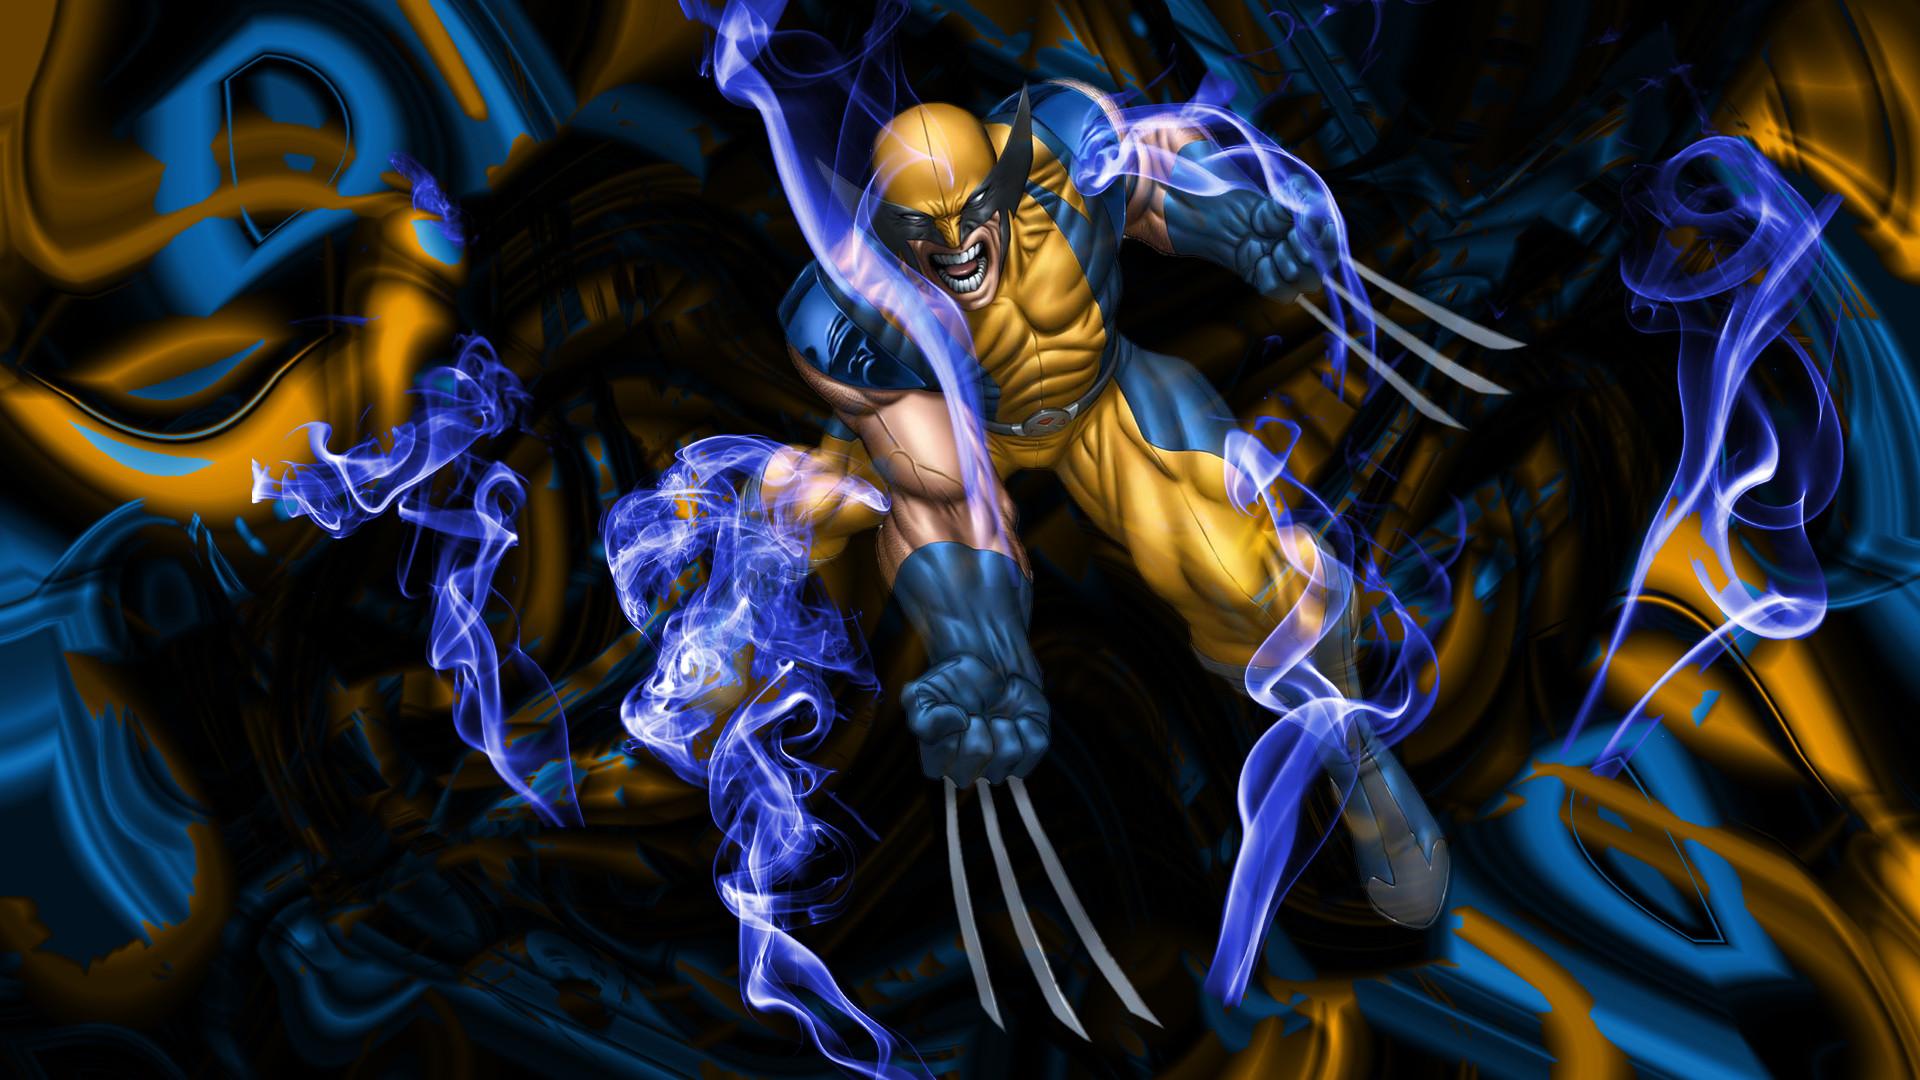 Wolverine Wallpaper by KyleCorroo on DeviantArt